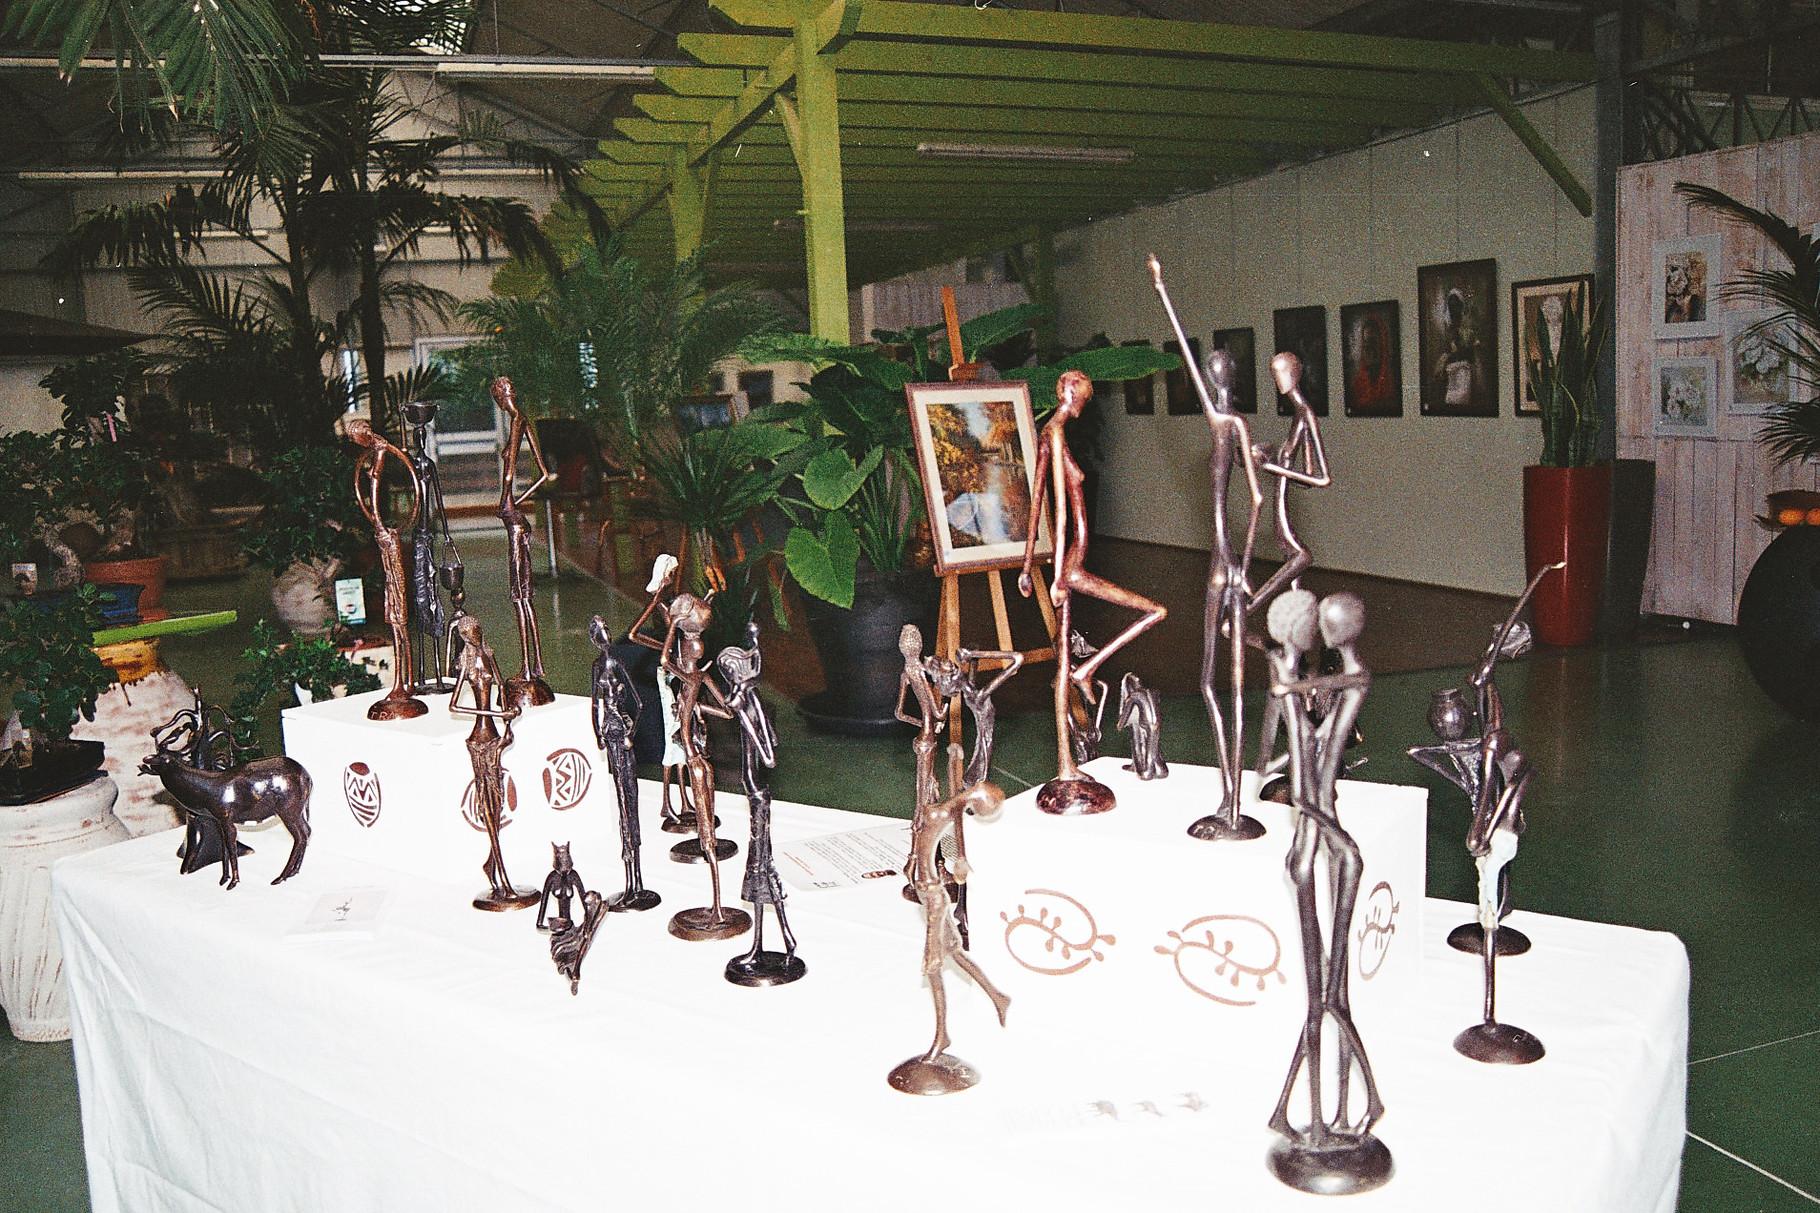 2014 - 47 Marmande - Jardinerie Jay - Exposition